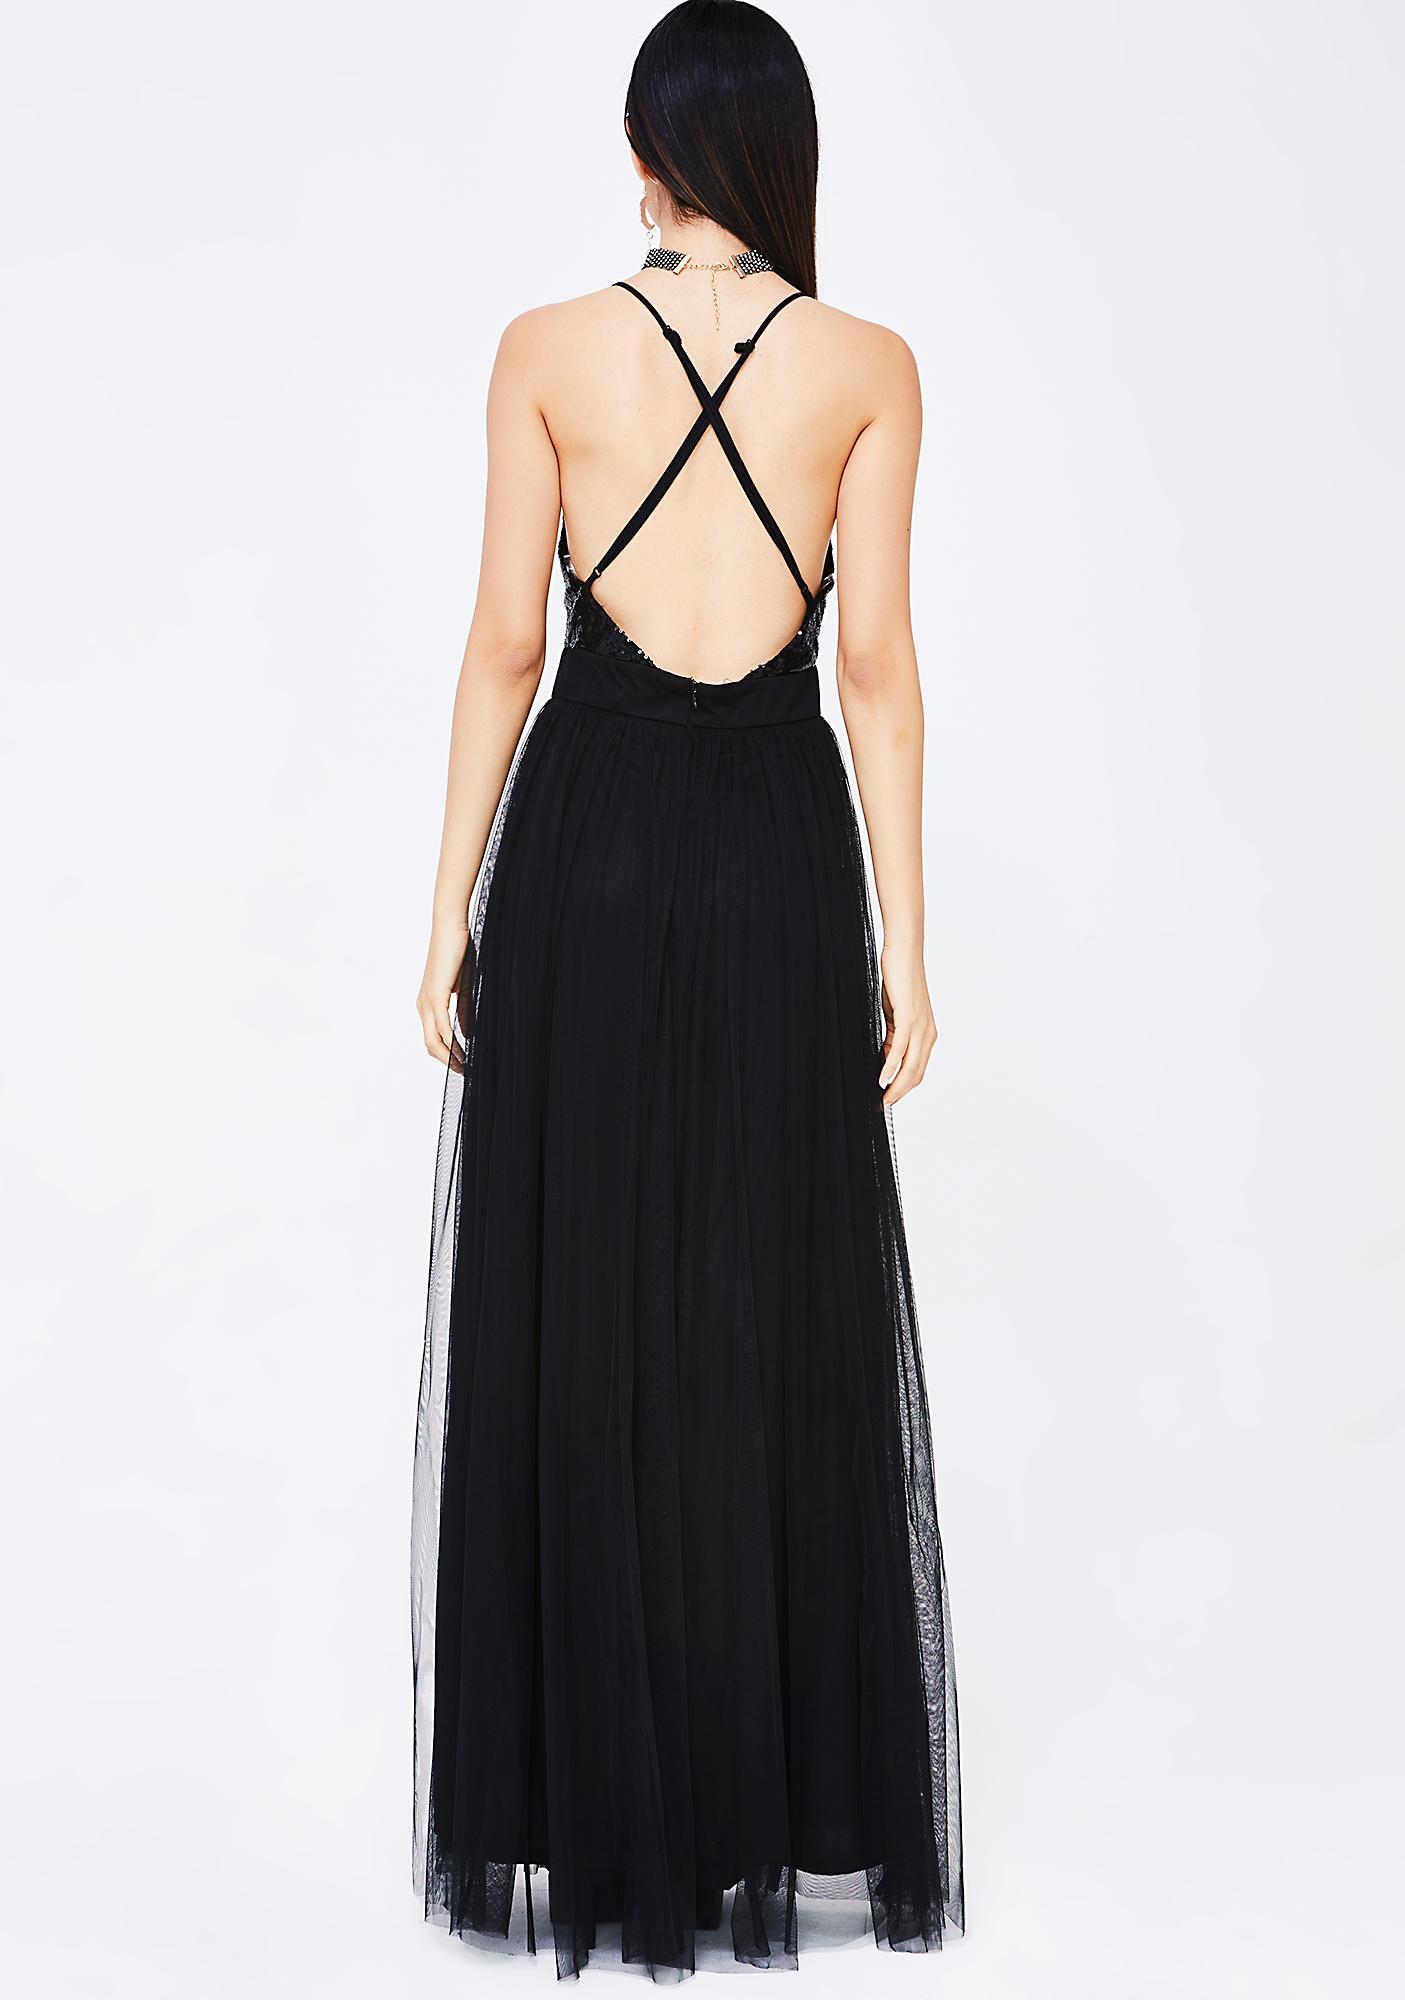 Stay Stunnin' Sequin Dress